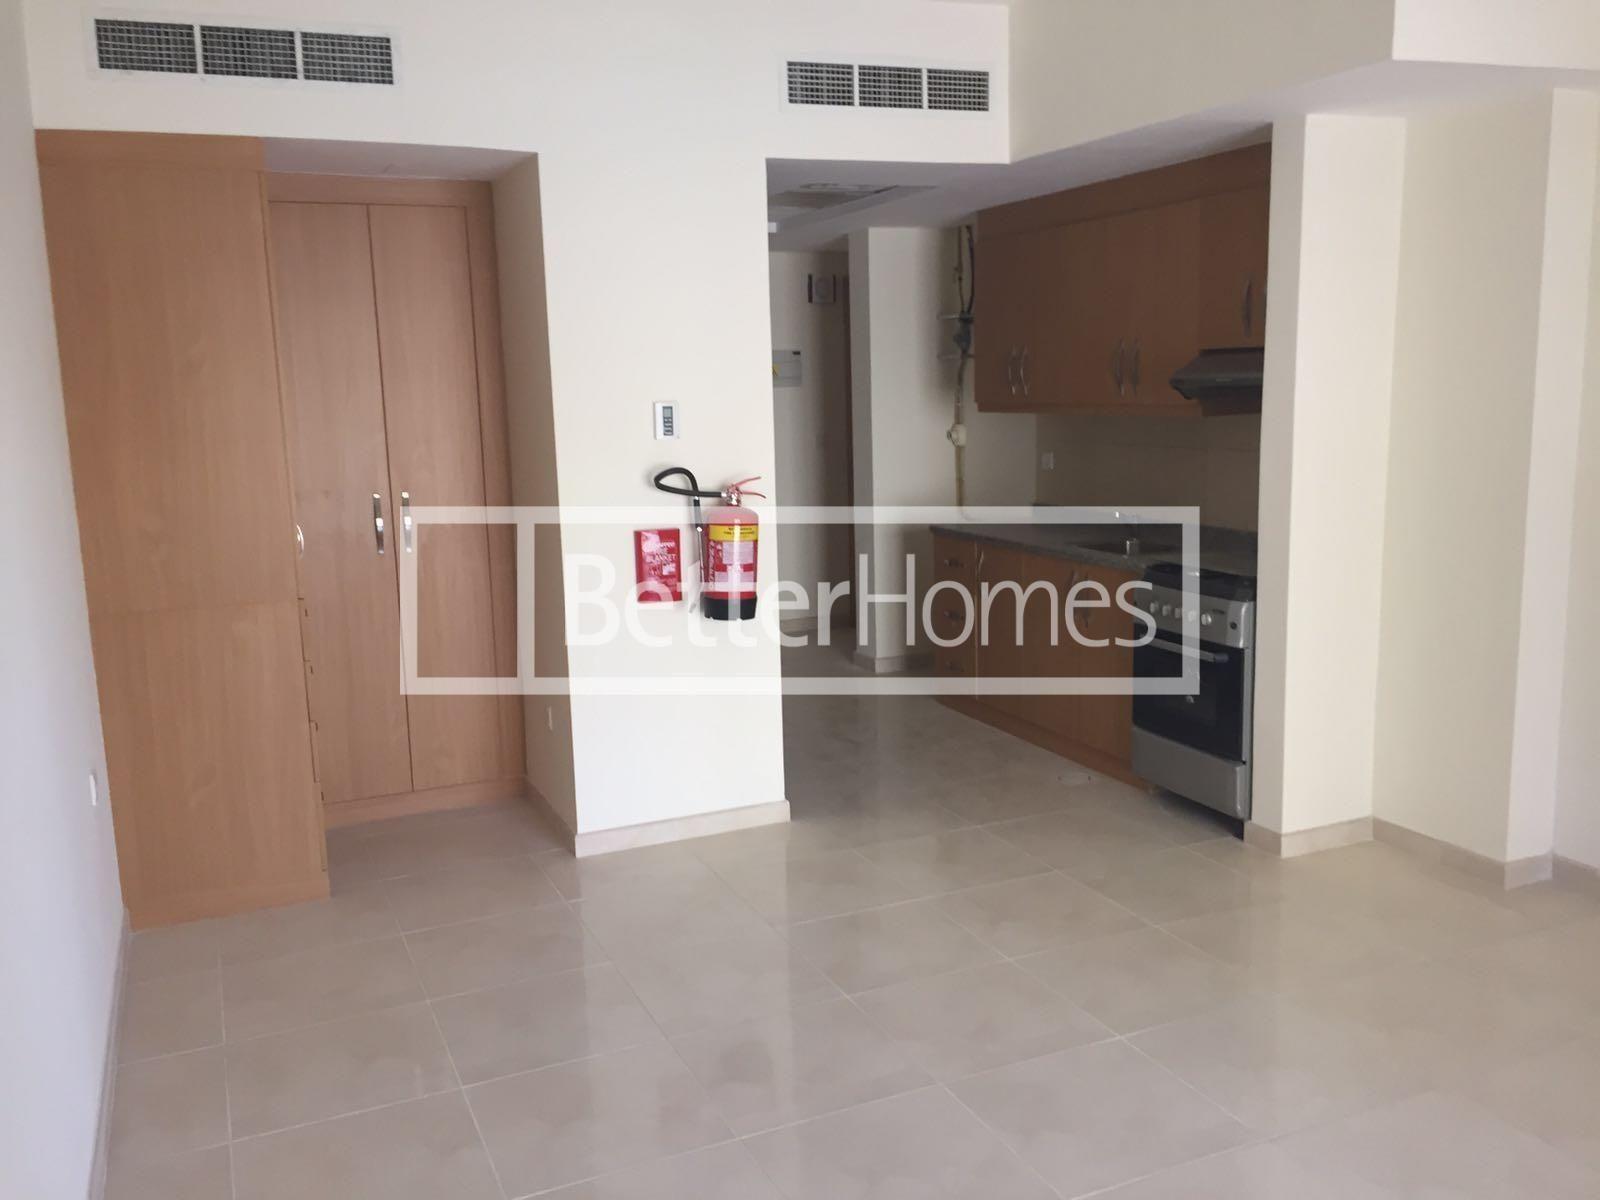 Studio Apartment in Lusail for Sale